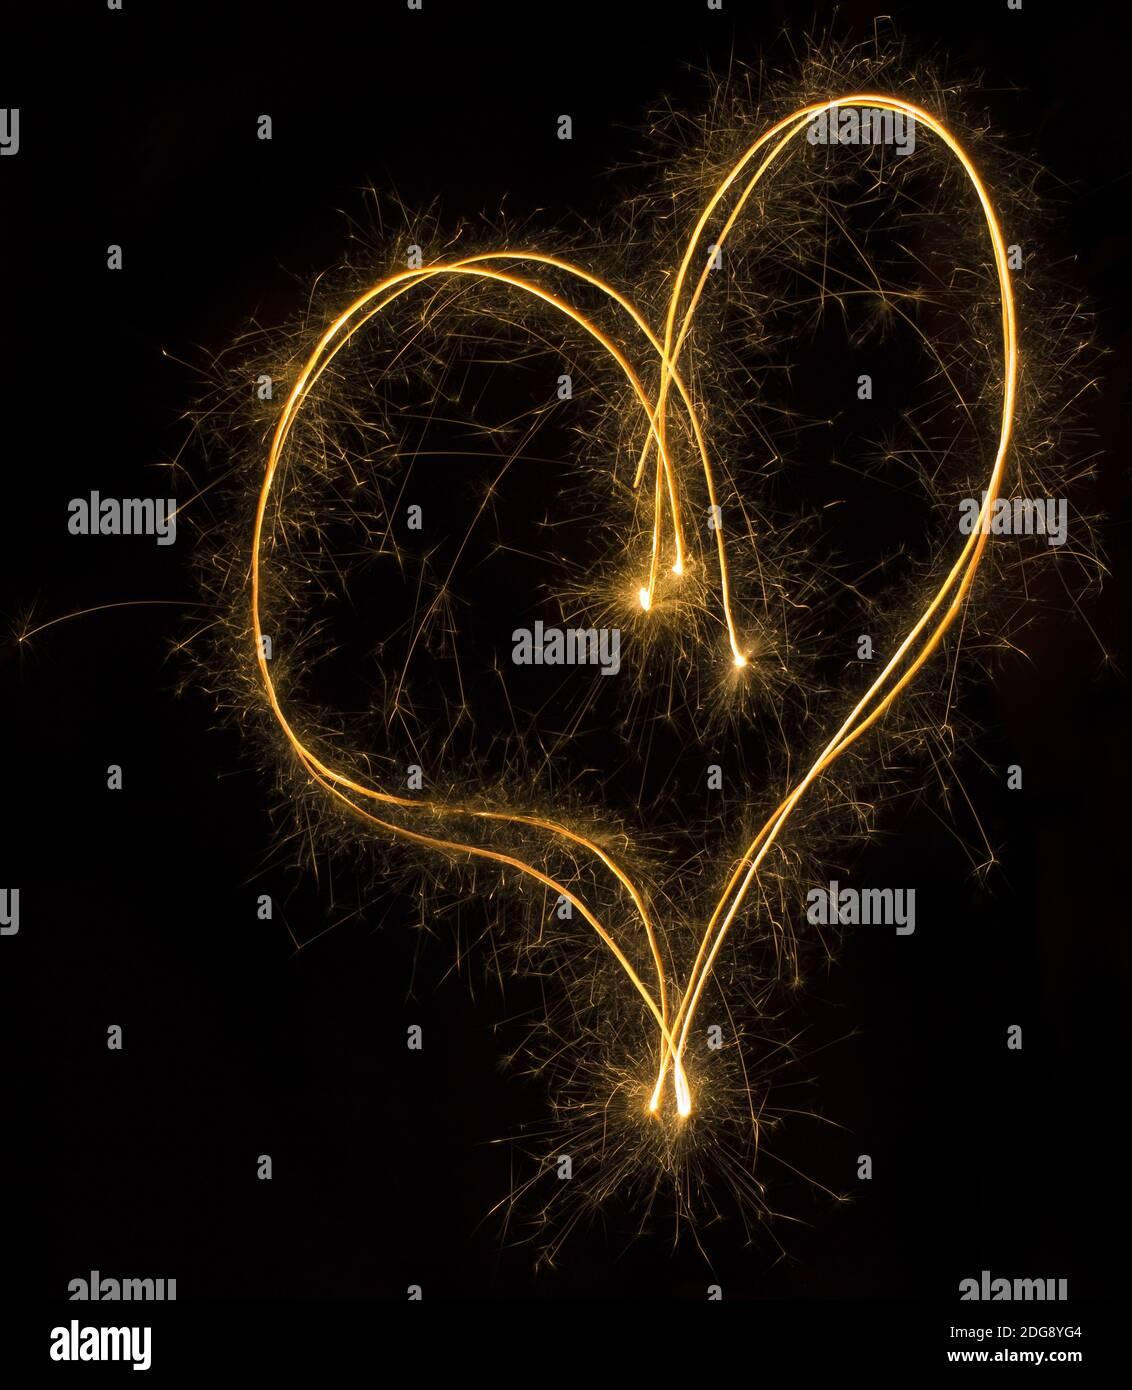 Sparkler Heart Symbol Stock Photo